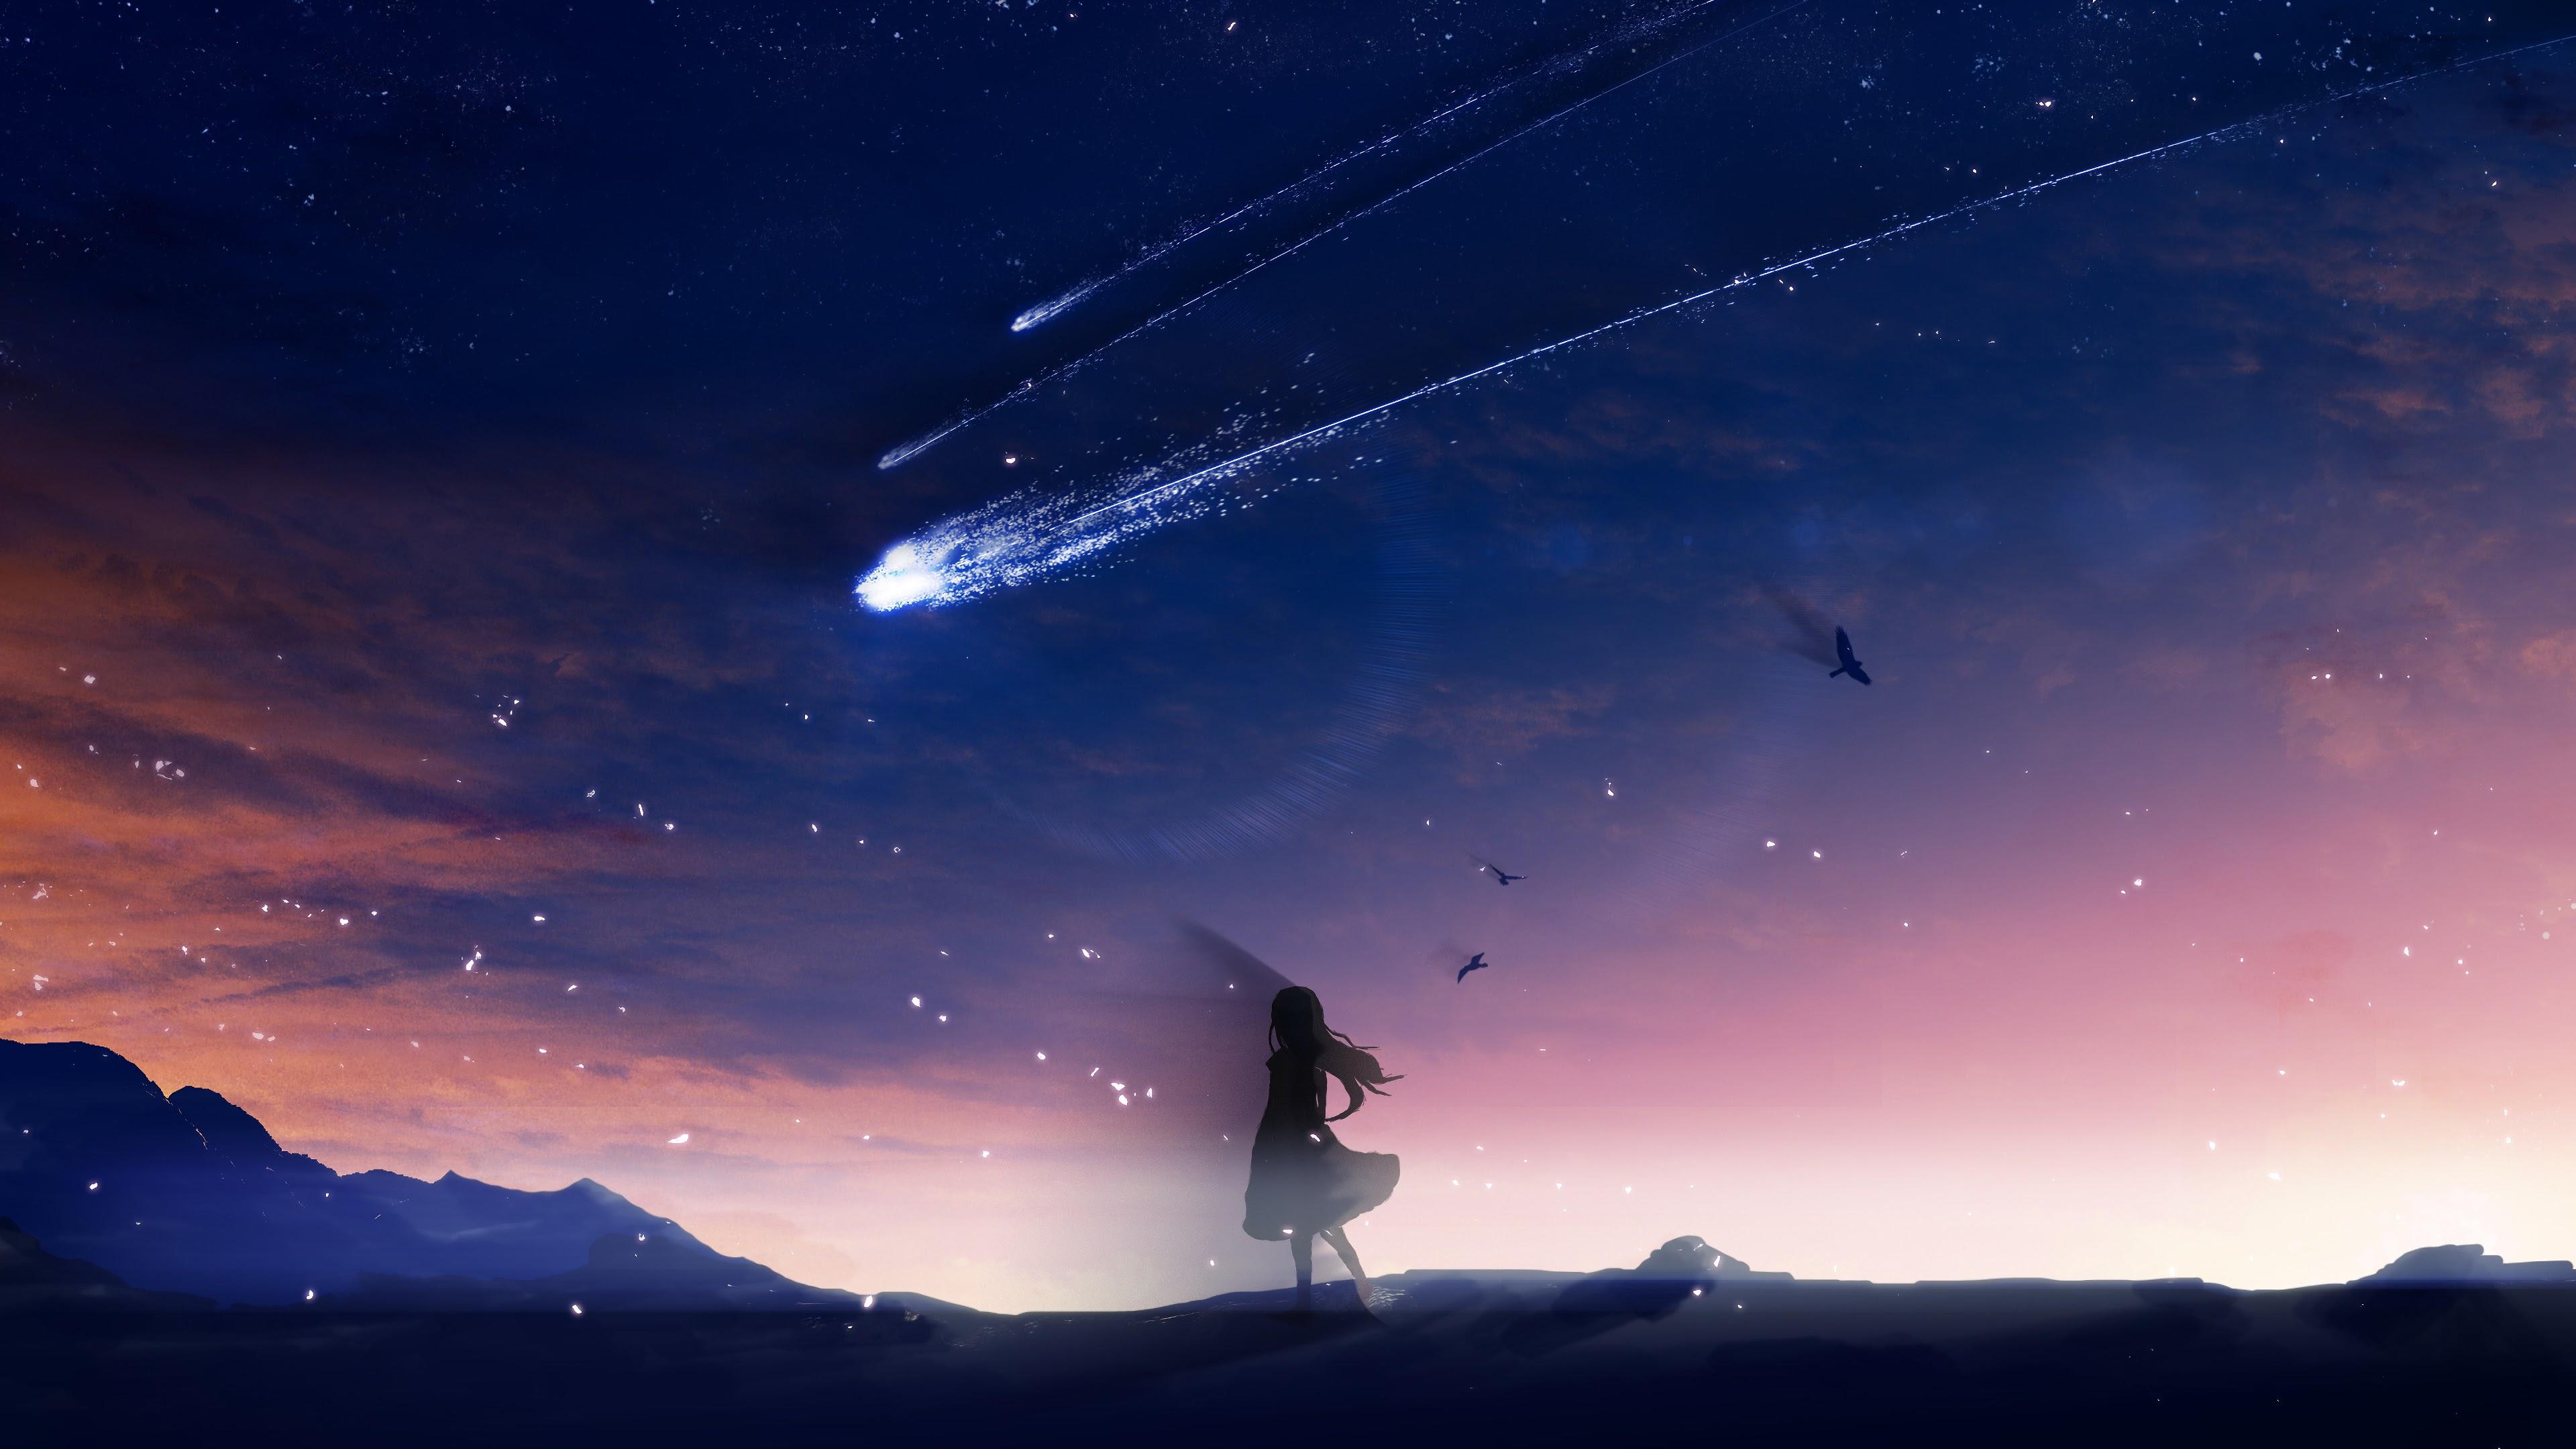 Anime, Night, Sky, Scenery, Comet, 4K, #119 Wallpaper